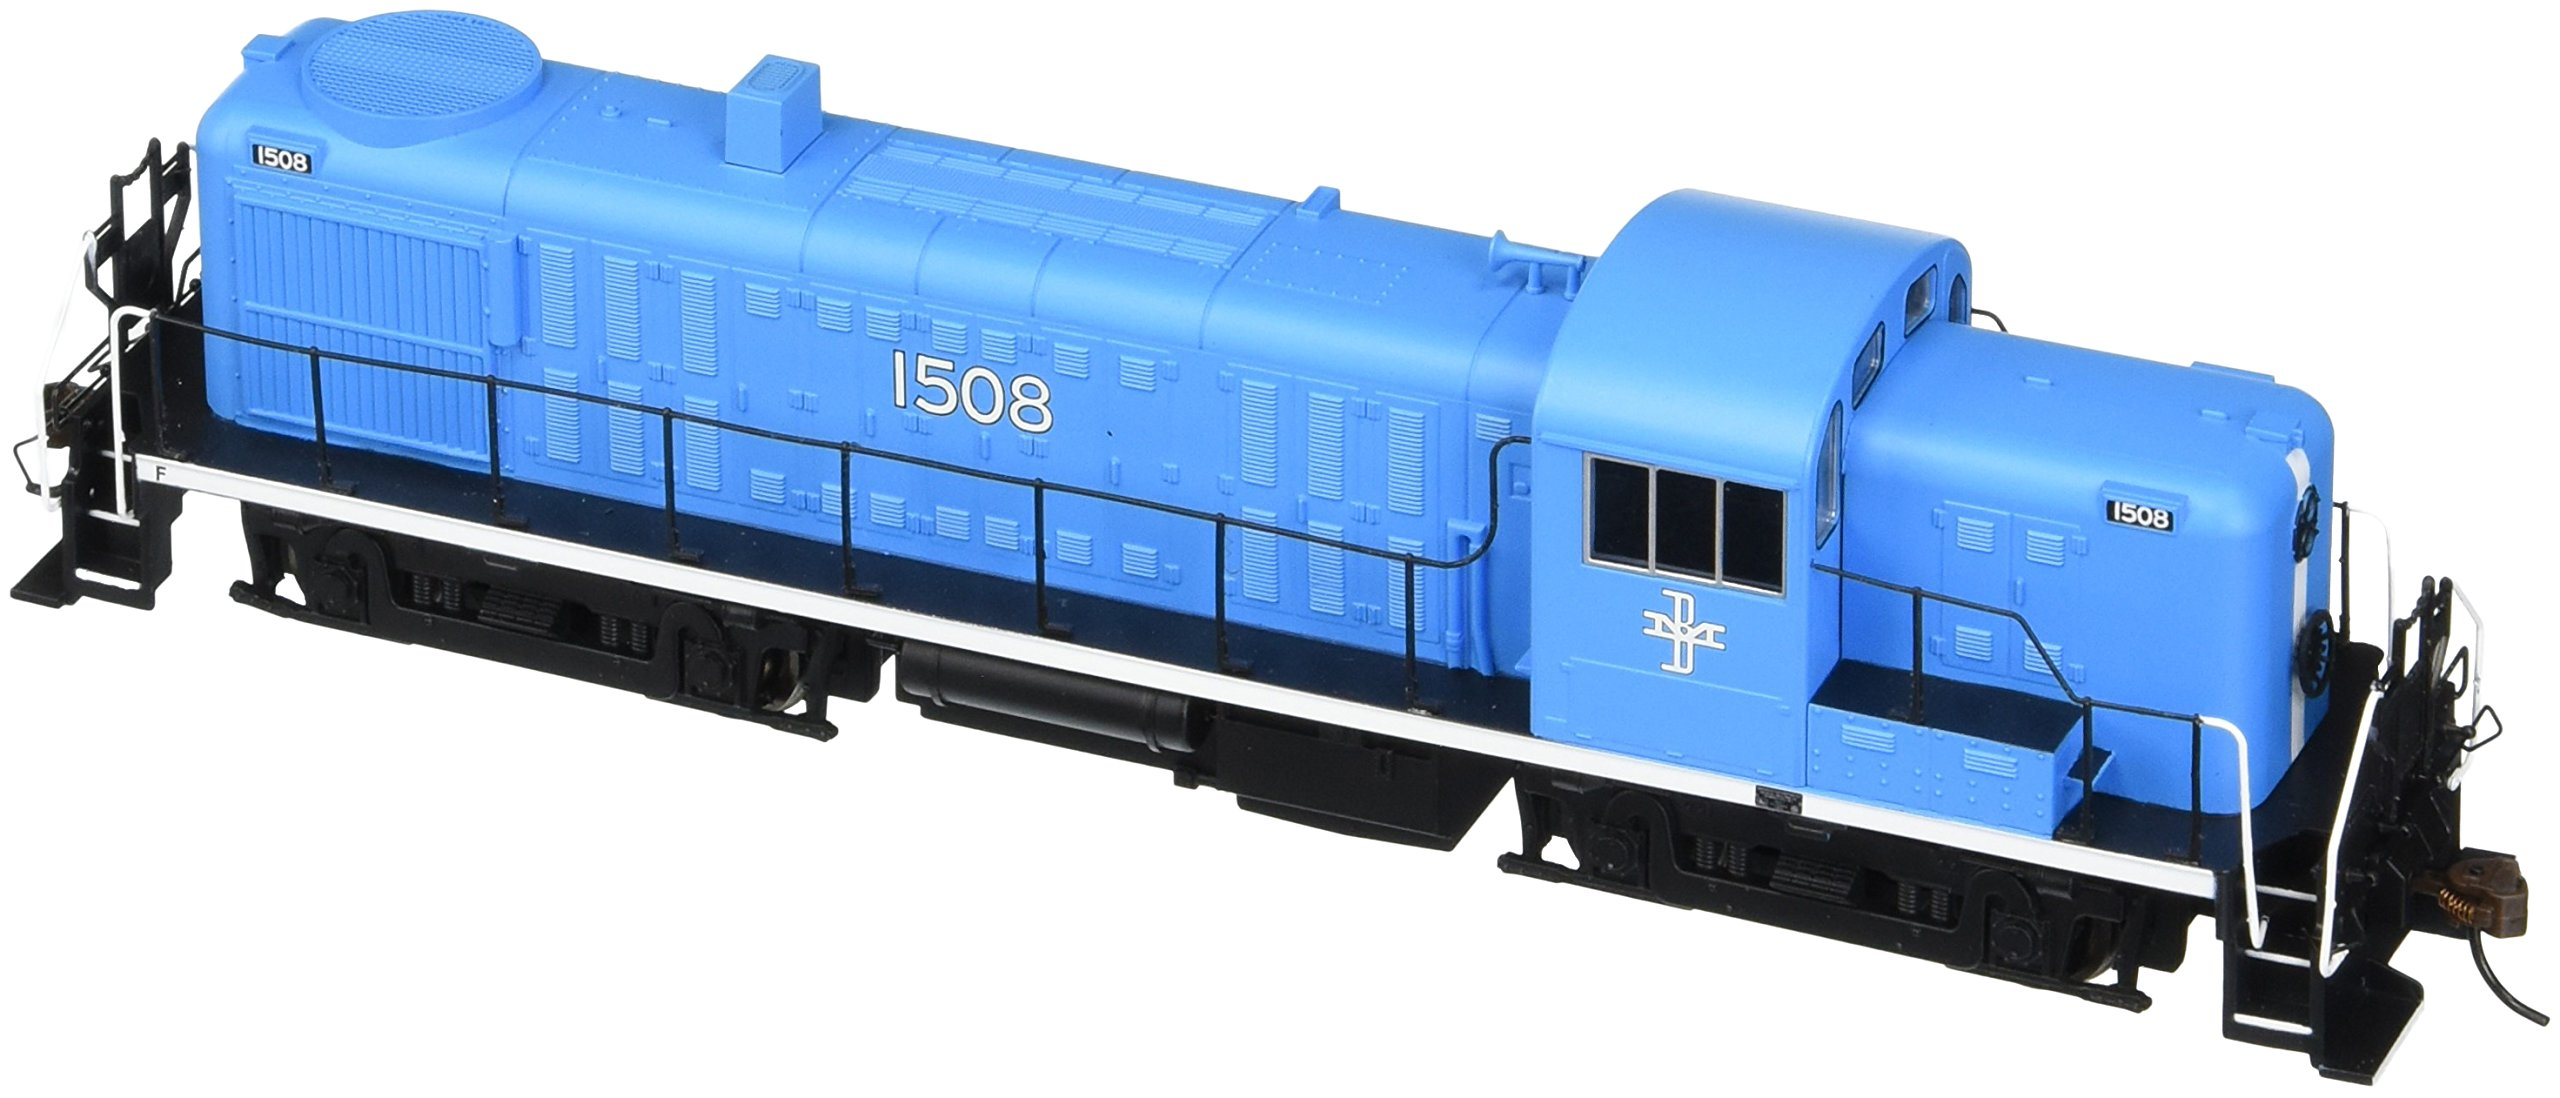 Bachmann Industries E-Z App Smart Phone Controlled McGinnis RS-3 Locomotive Train